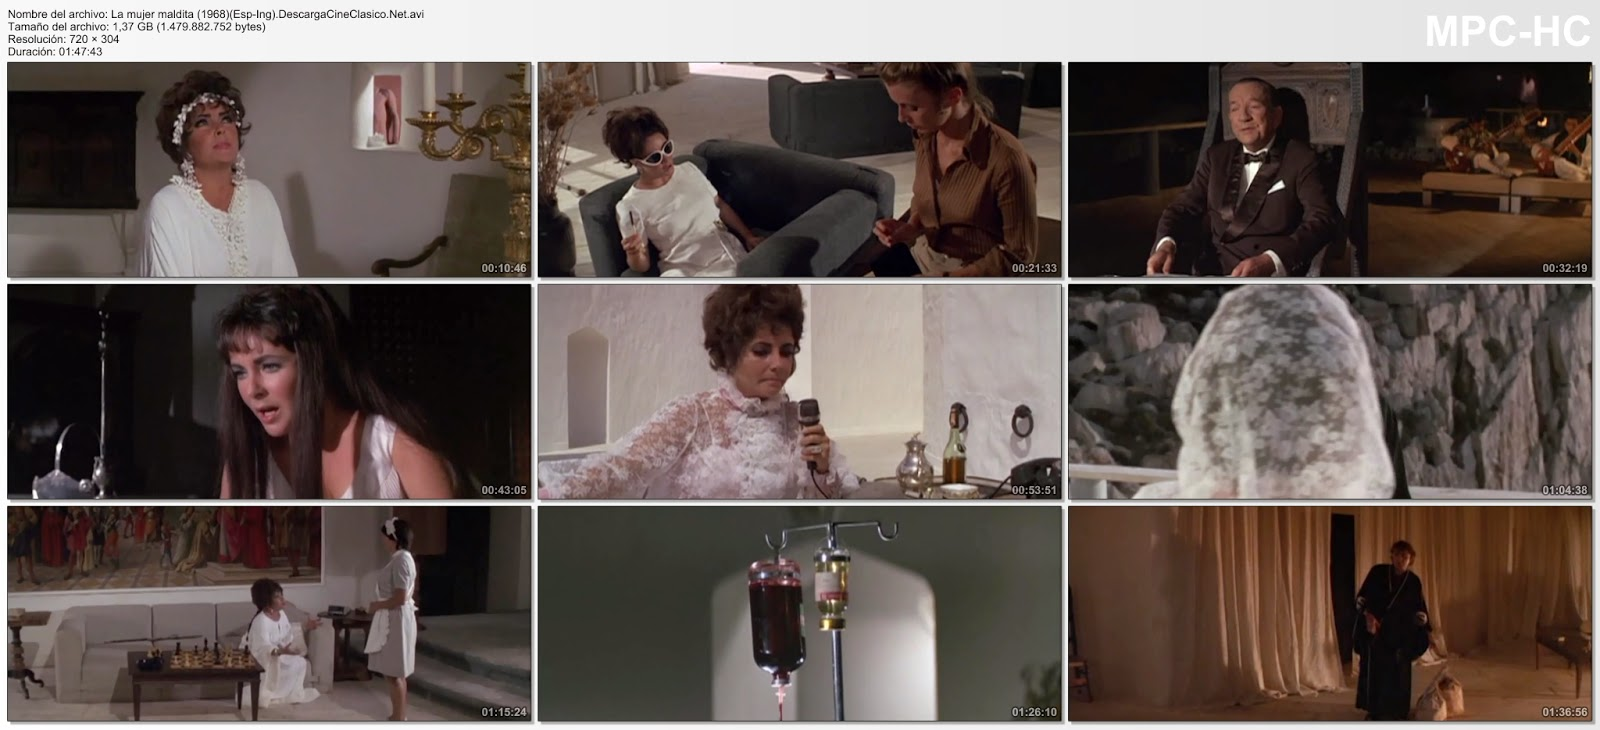 La mujer maldita (Boom)(1968)